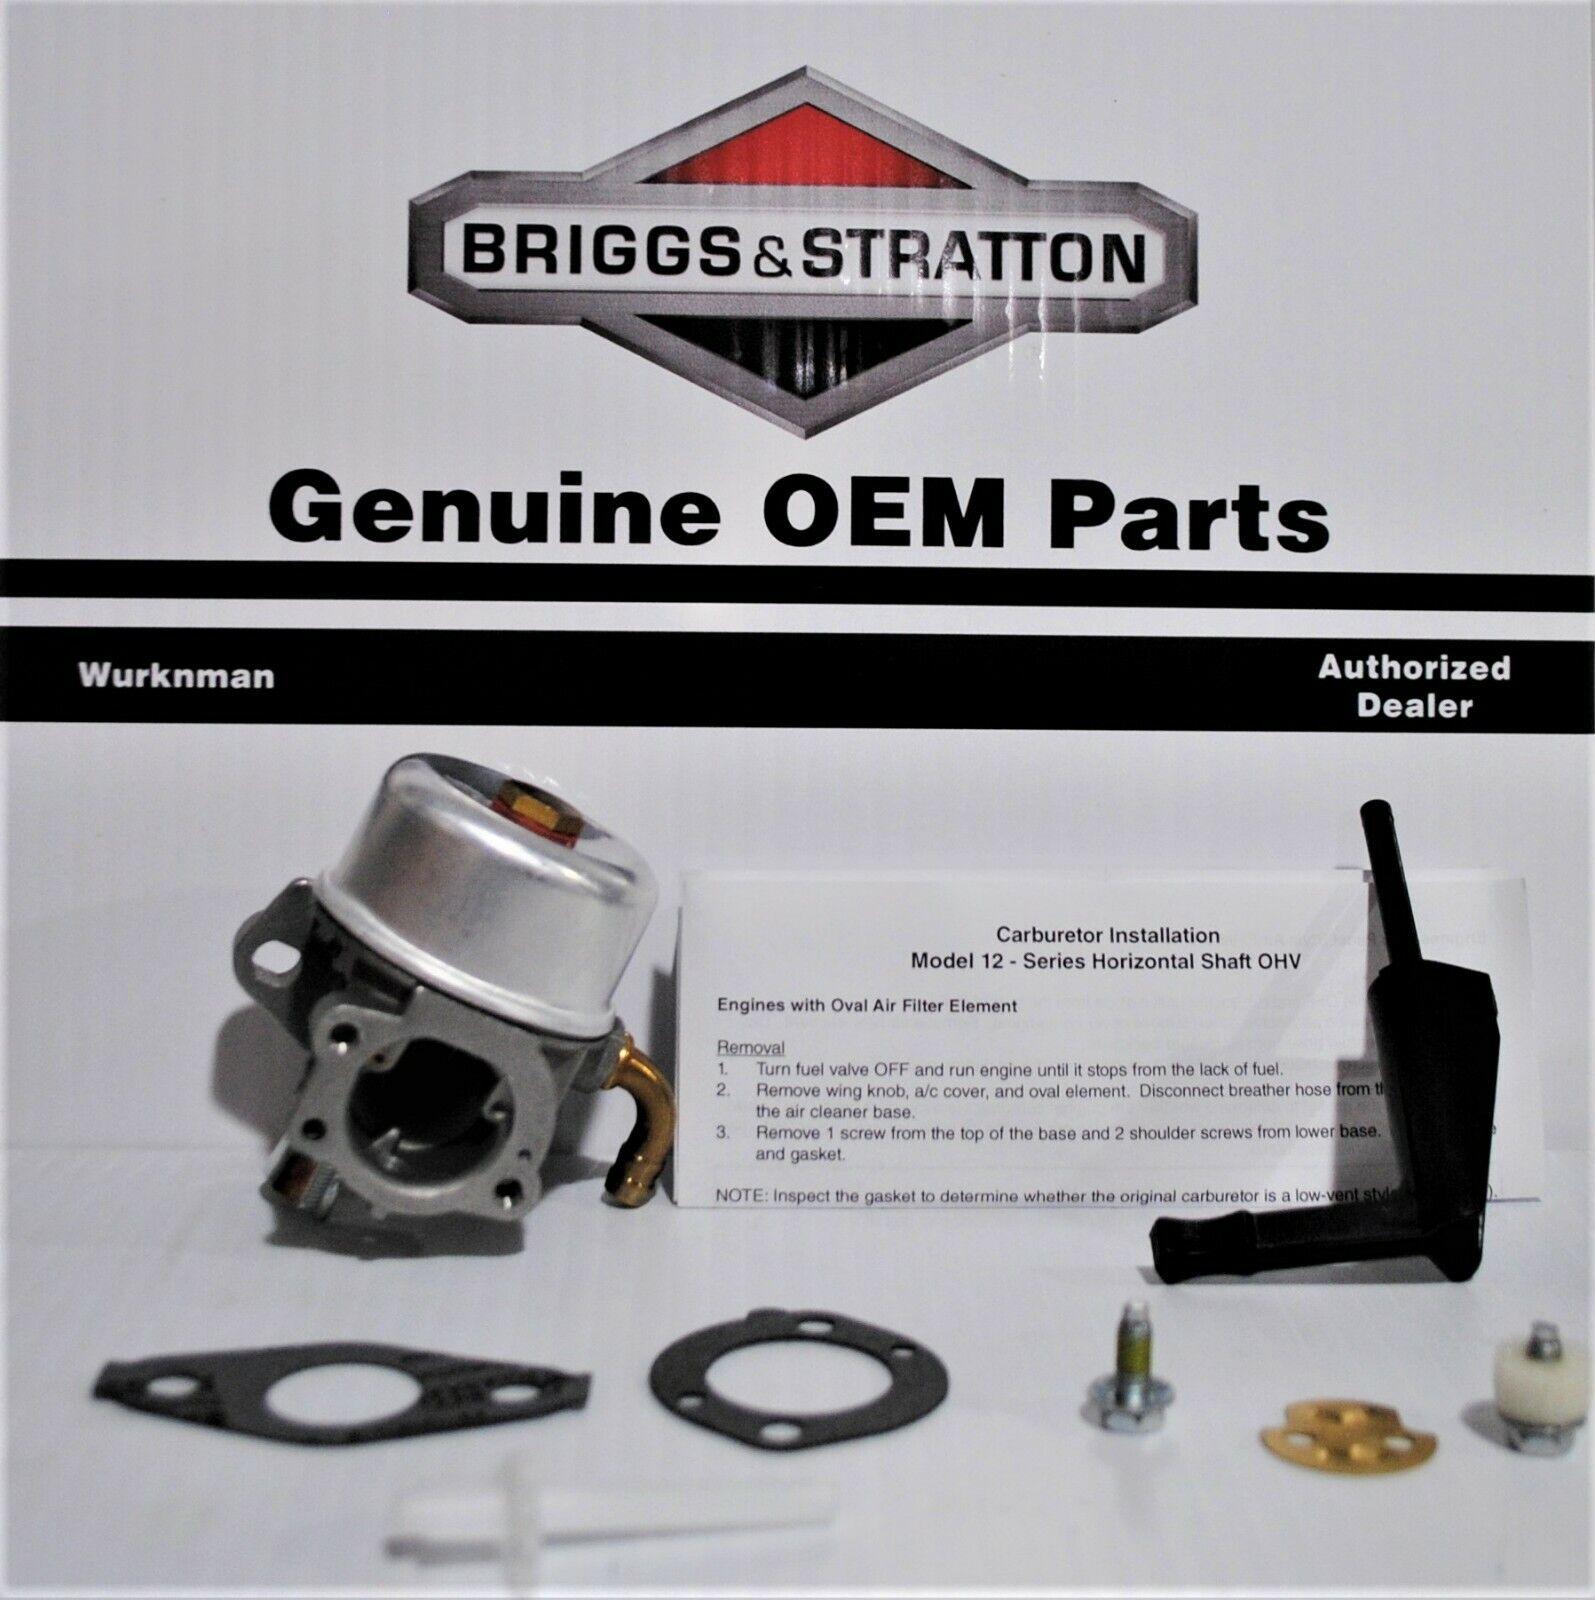 Genuine OEM BRIGGS & Stratton 591299 Cocheburador 798650 6984 74 791991